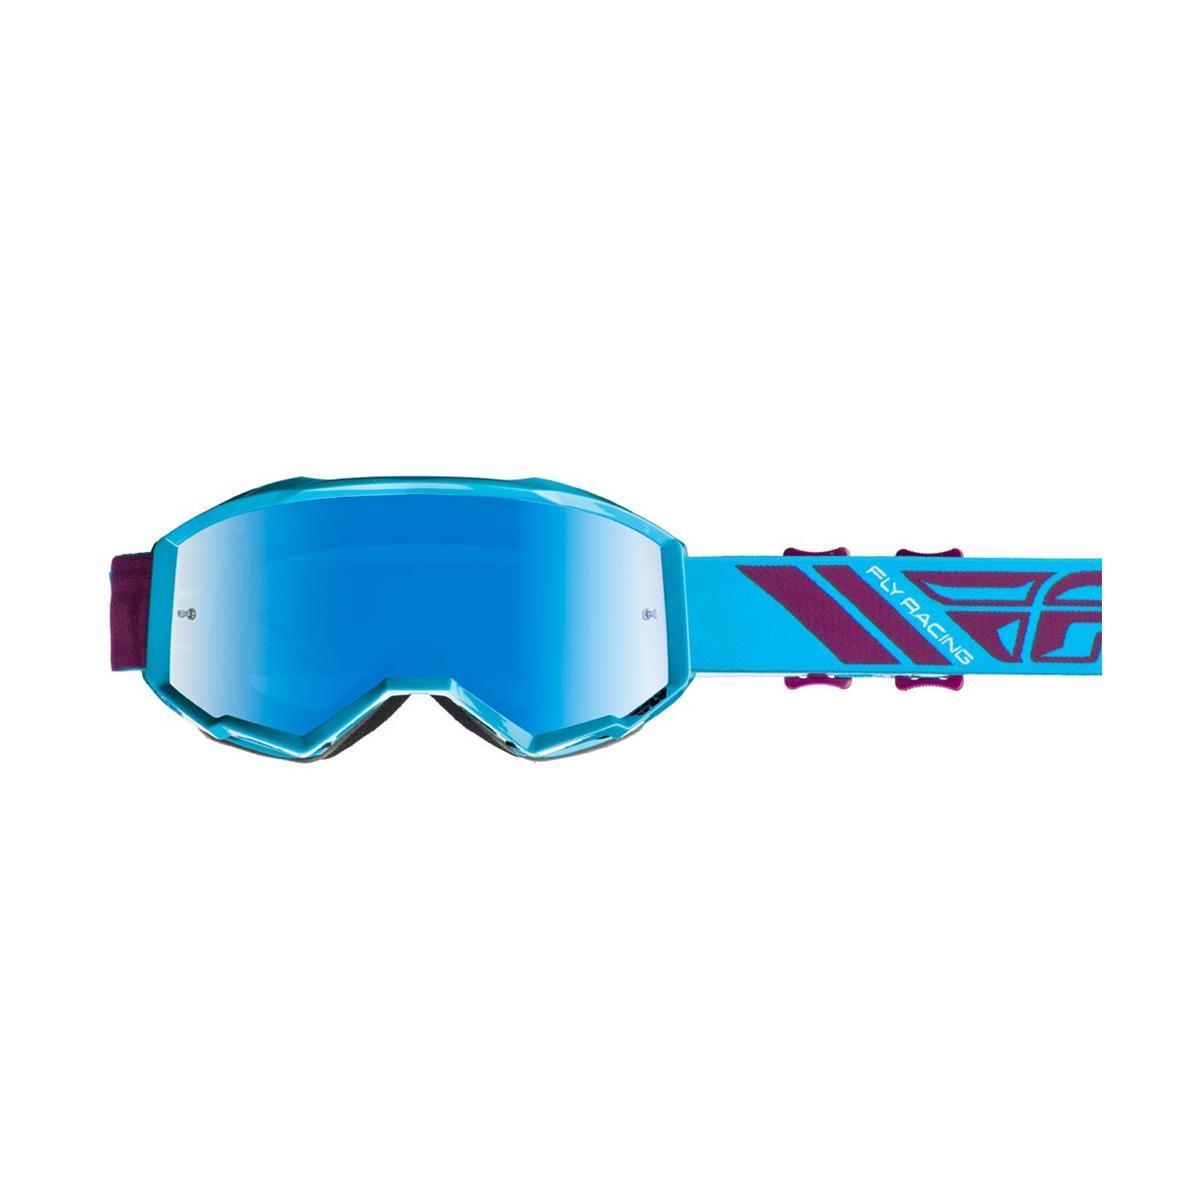 Fly Racing Crossbrille Zone Teal - Blau Smoke